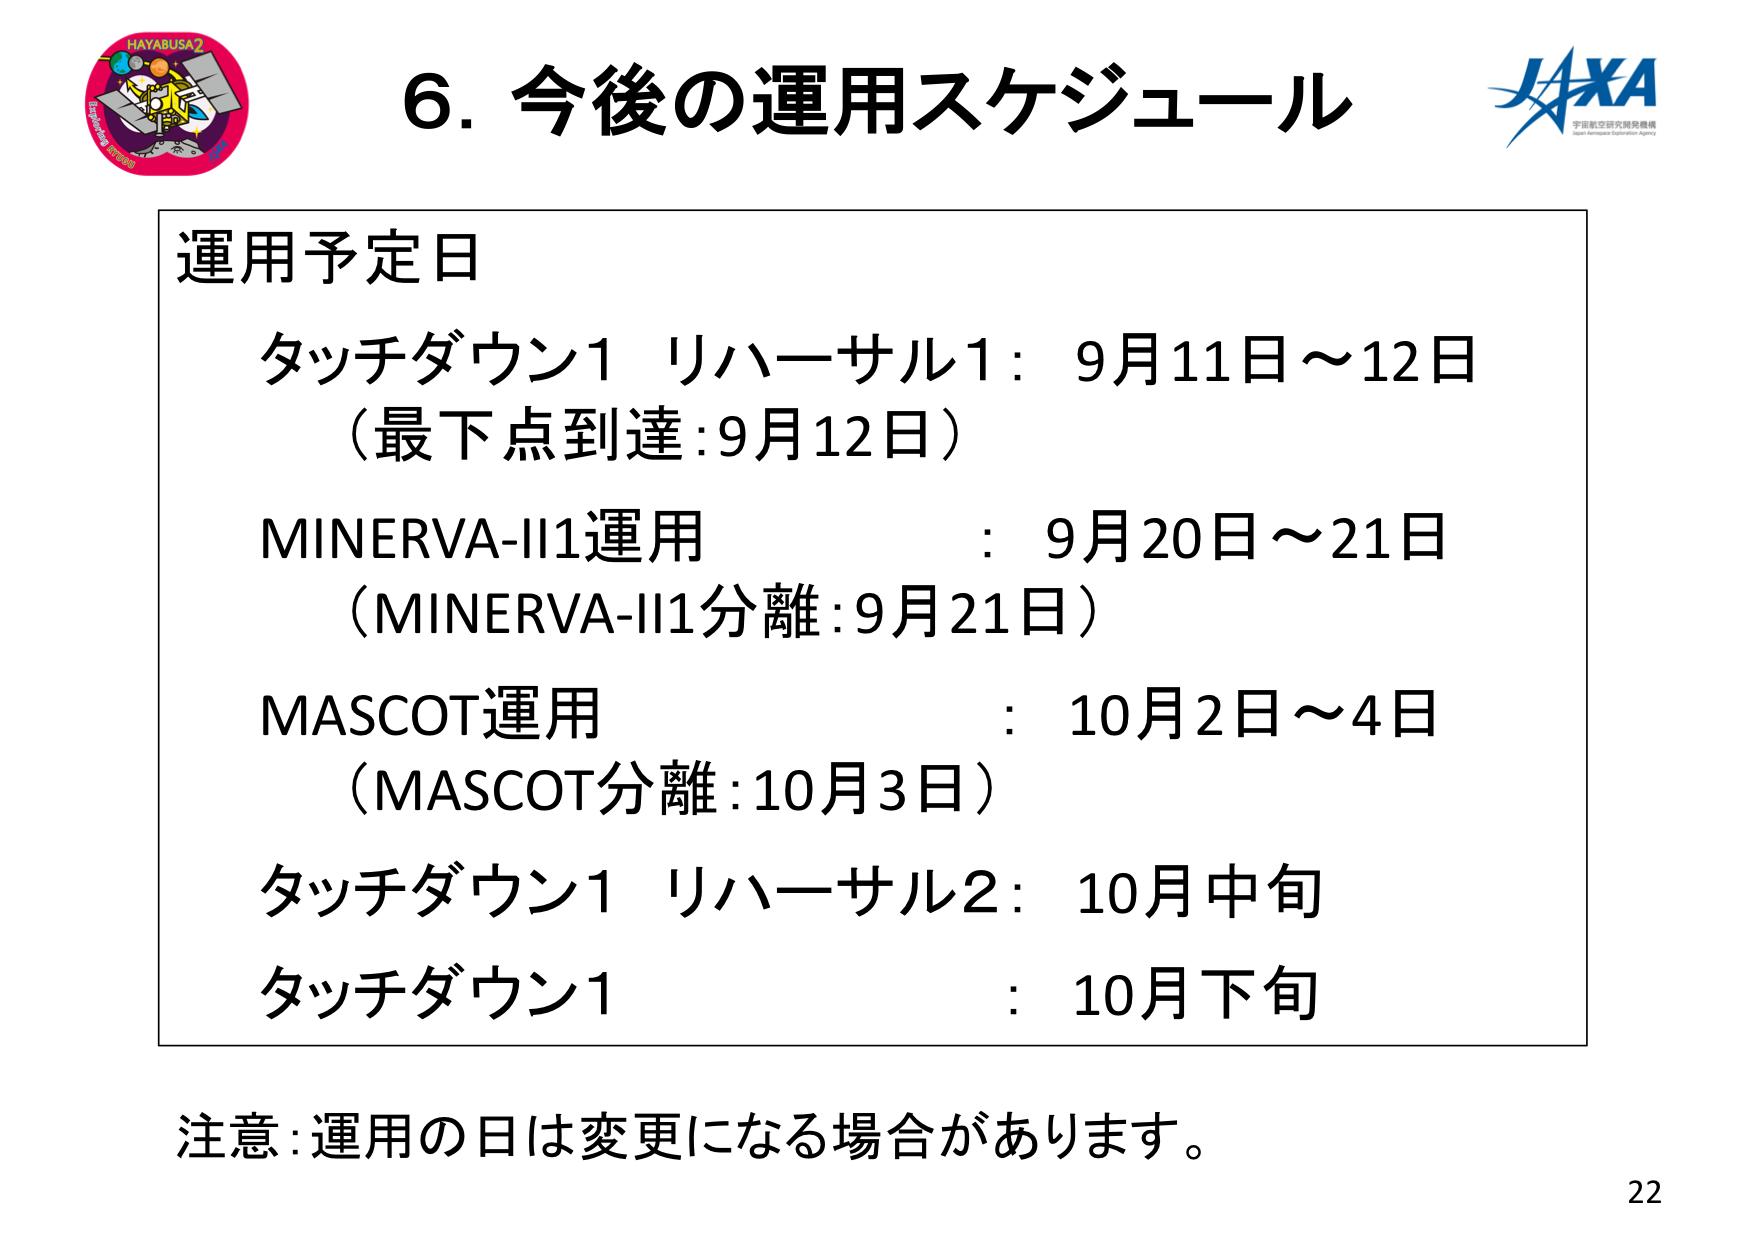 f:id:Imamura:20180905231954p:plain